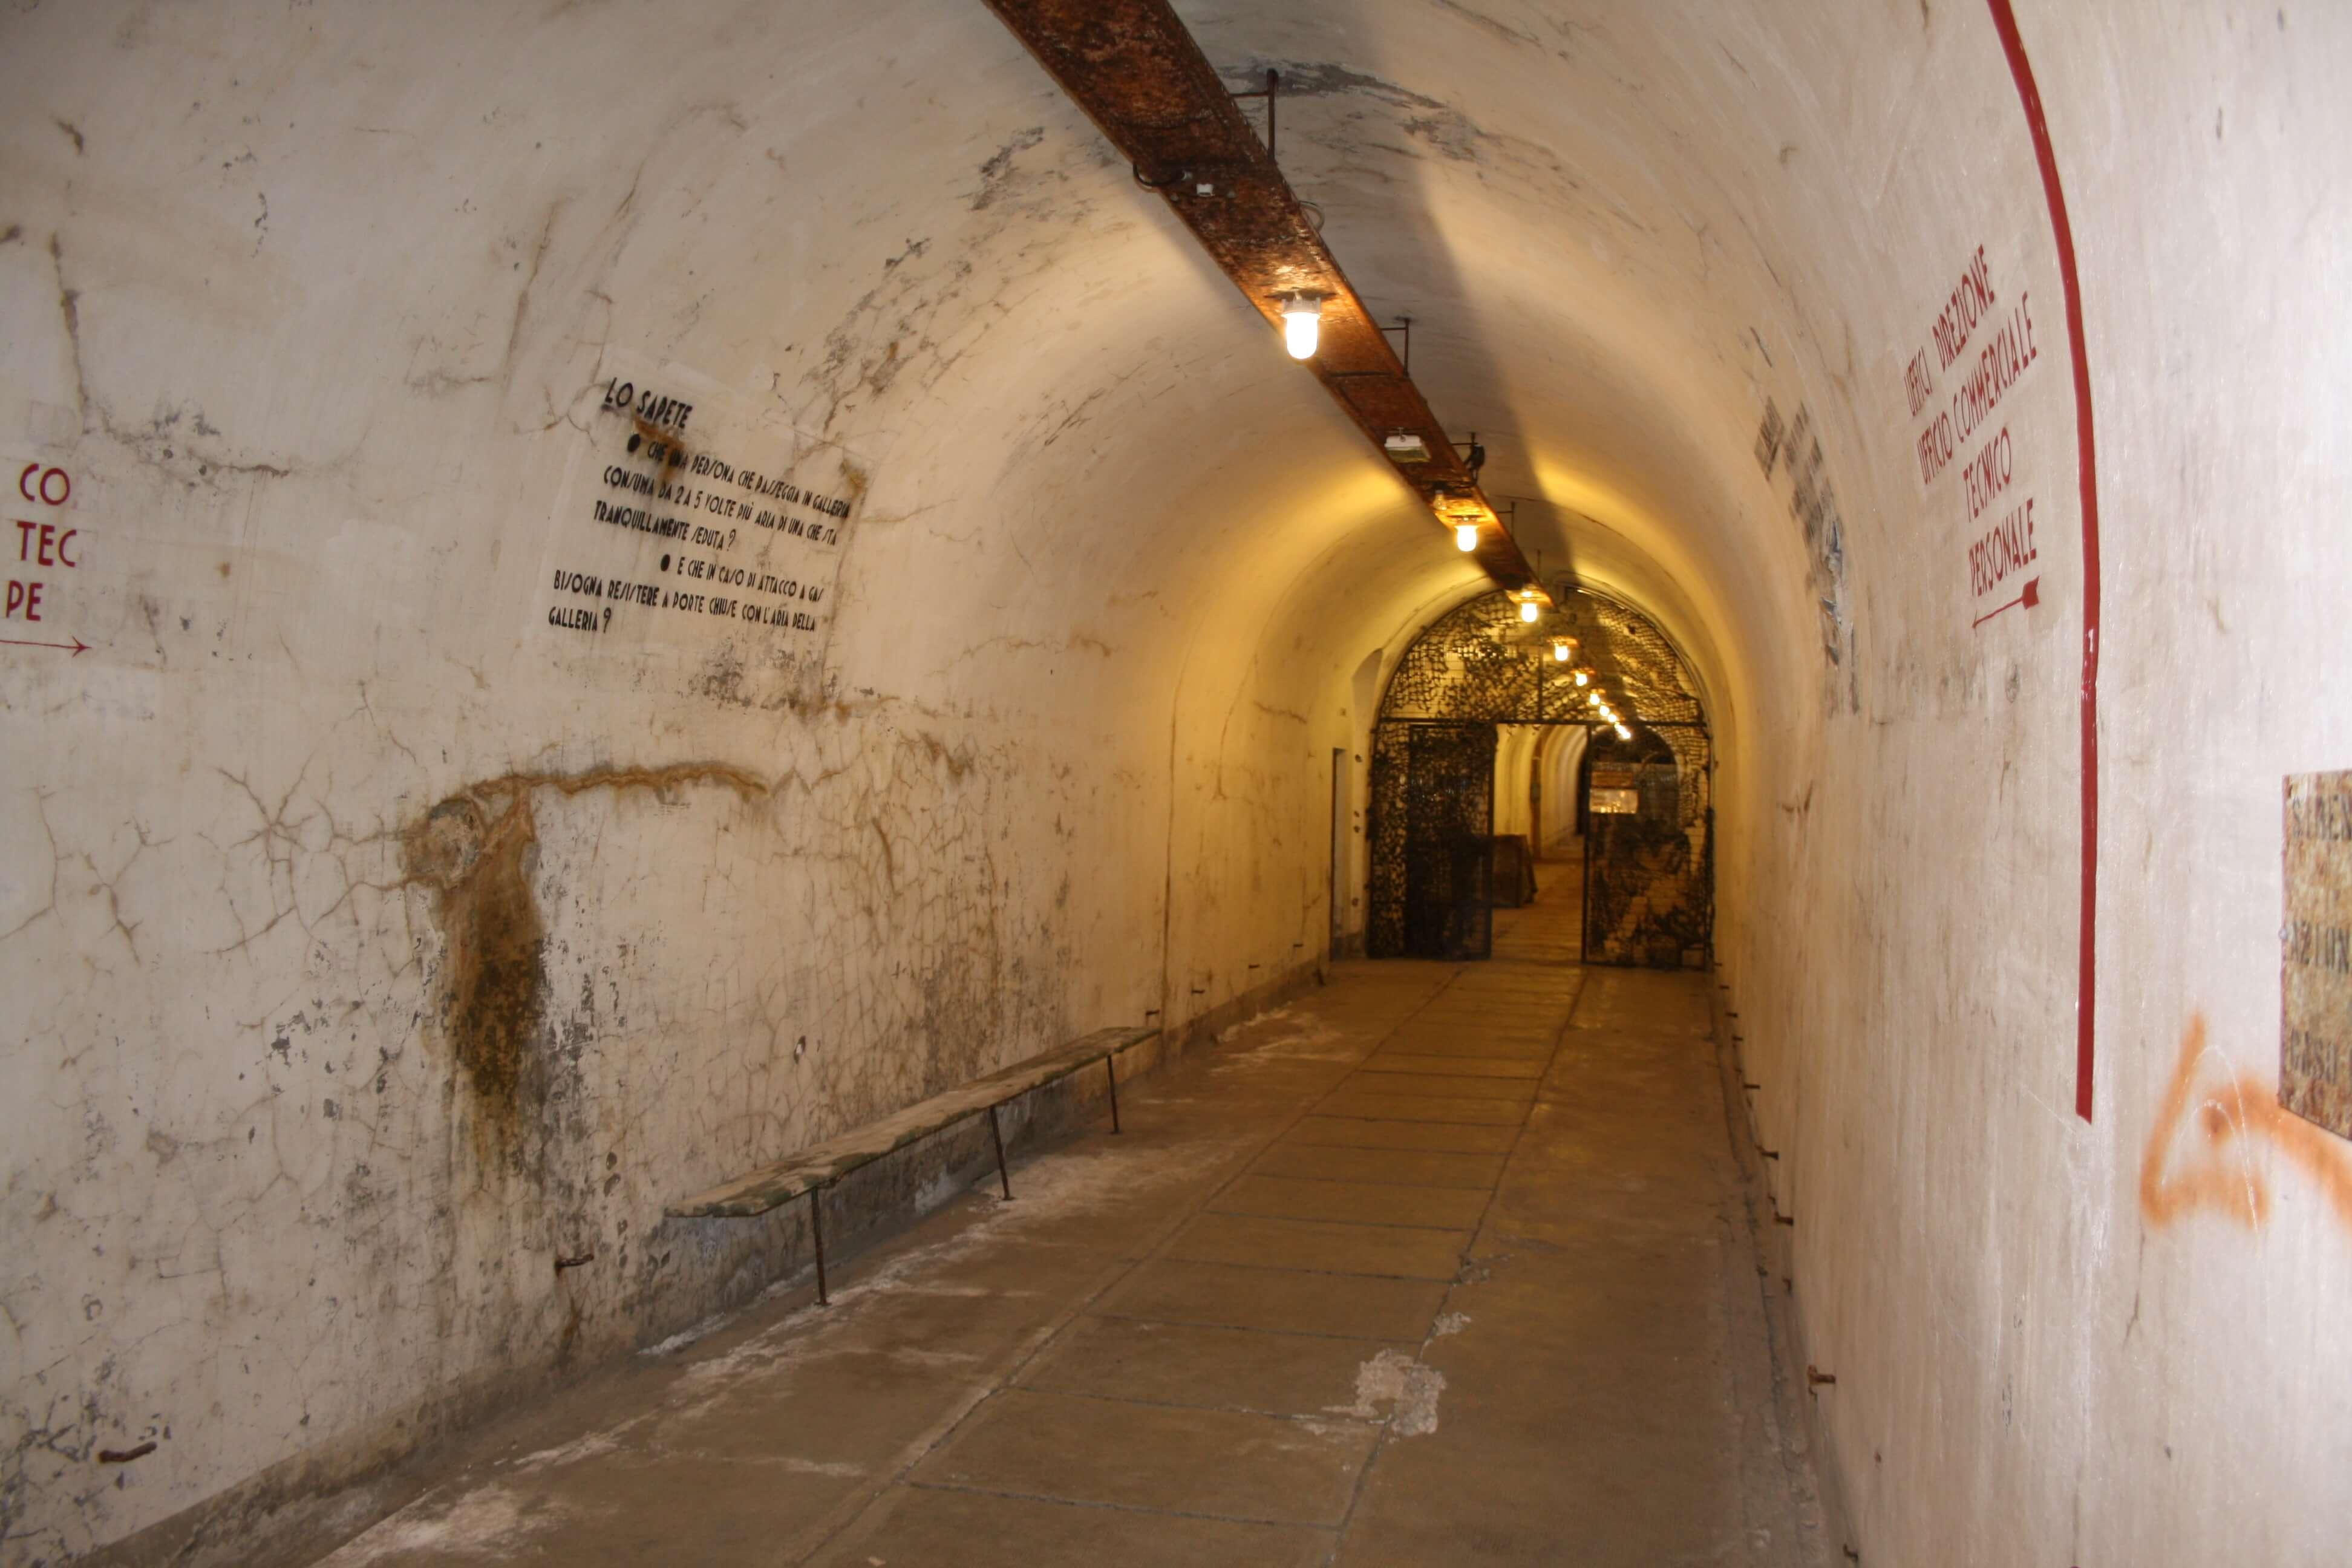 Toscana underground: SMI